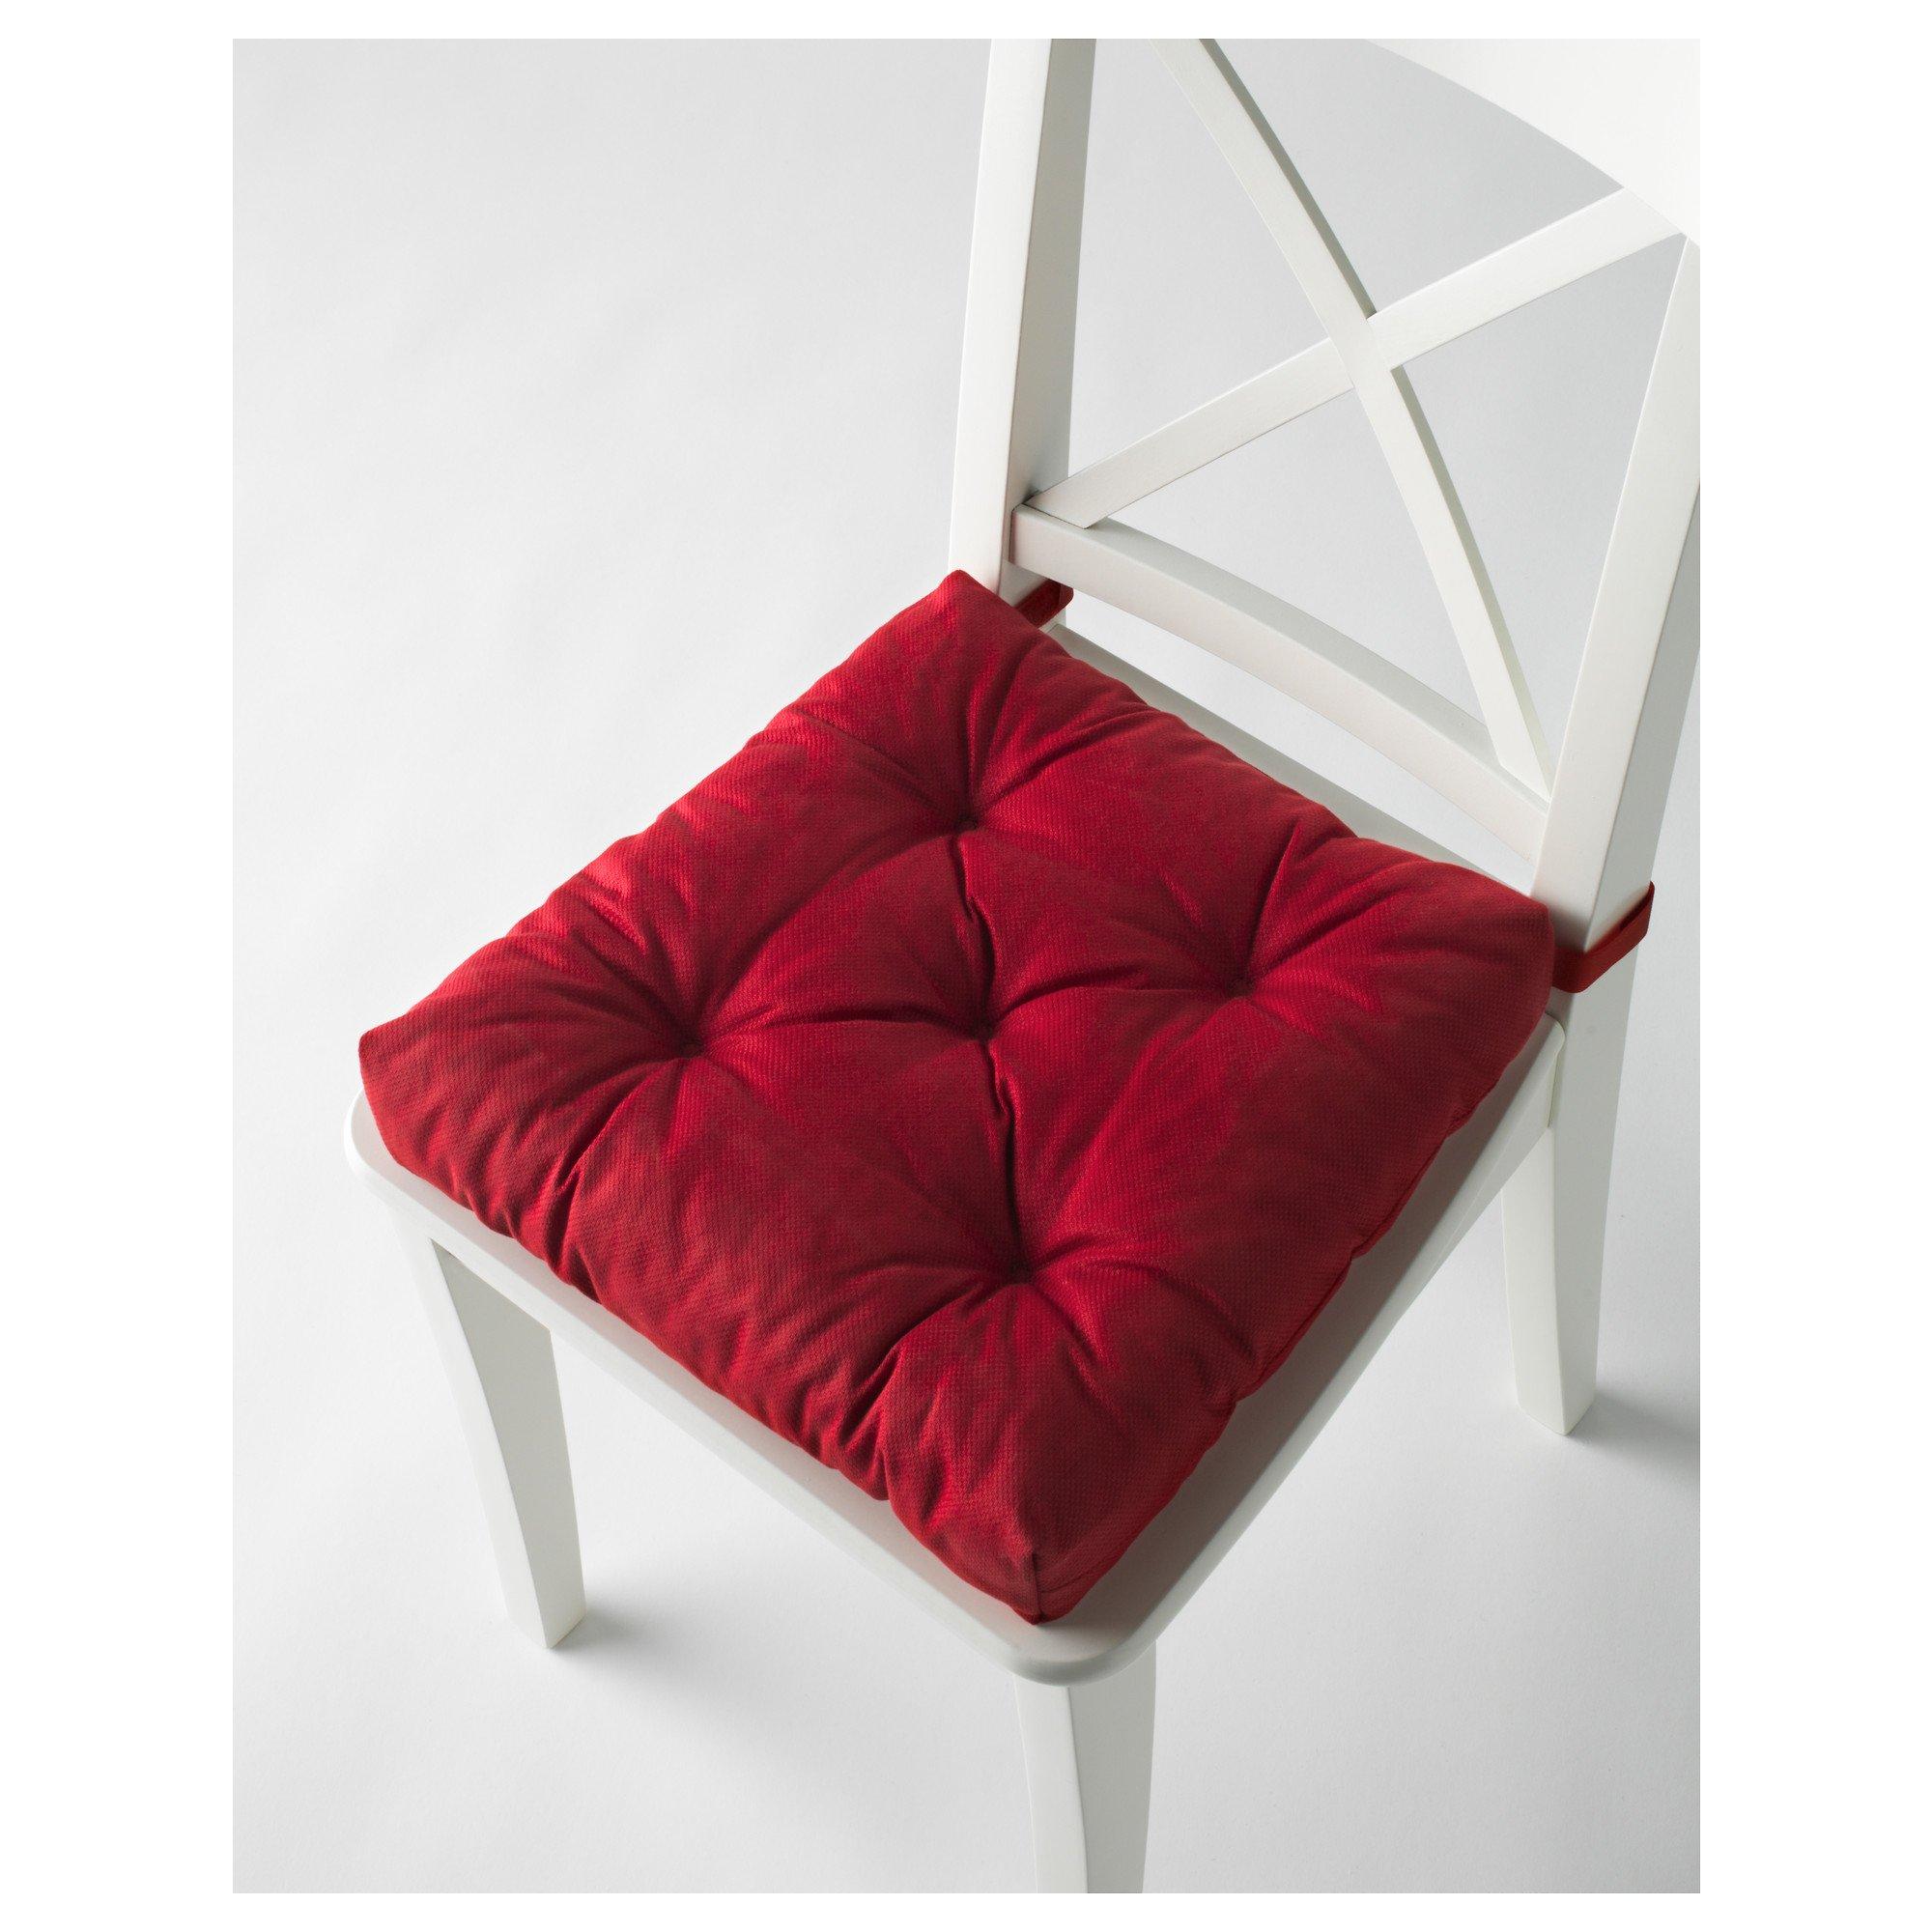 Ikeas MALINDA Chair cushion (1, Red) by Ikea (Image #1)